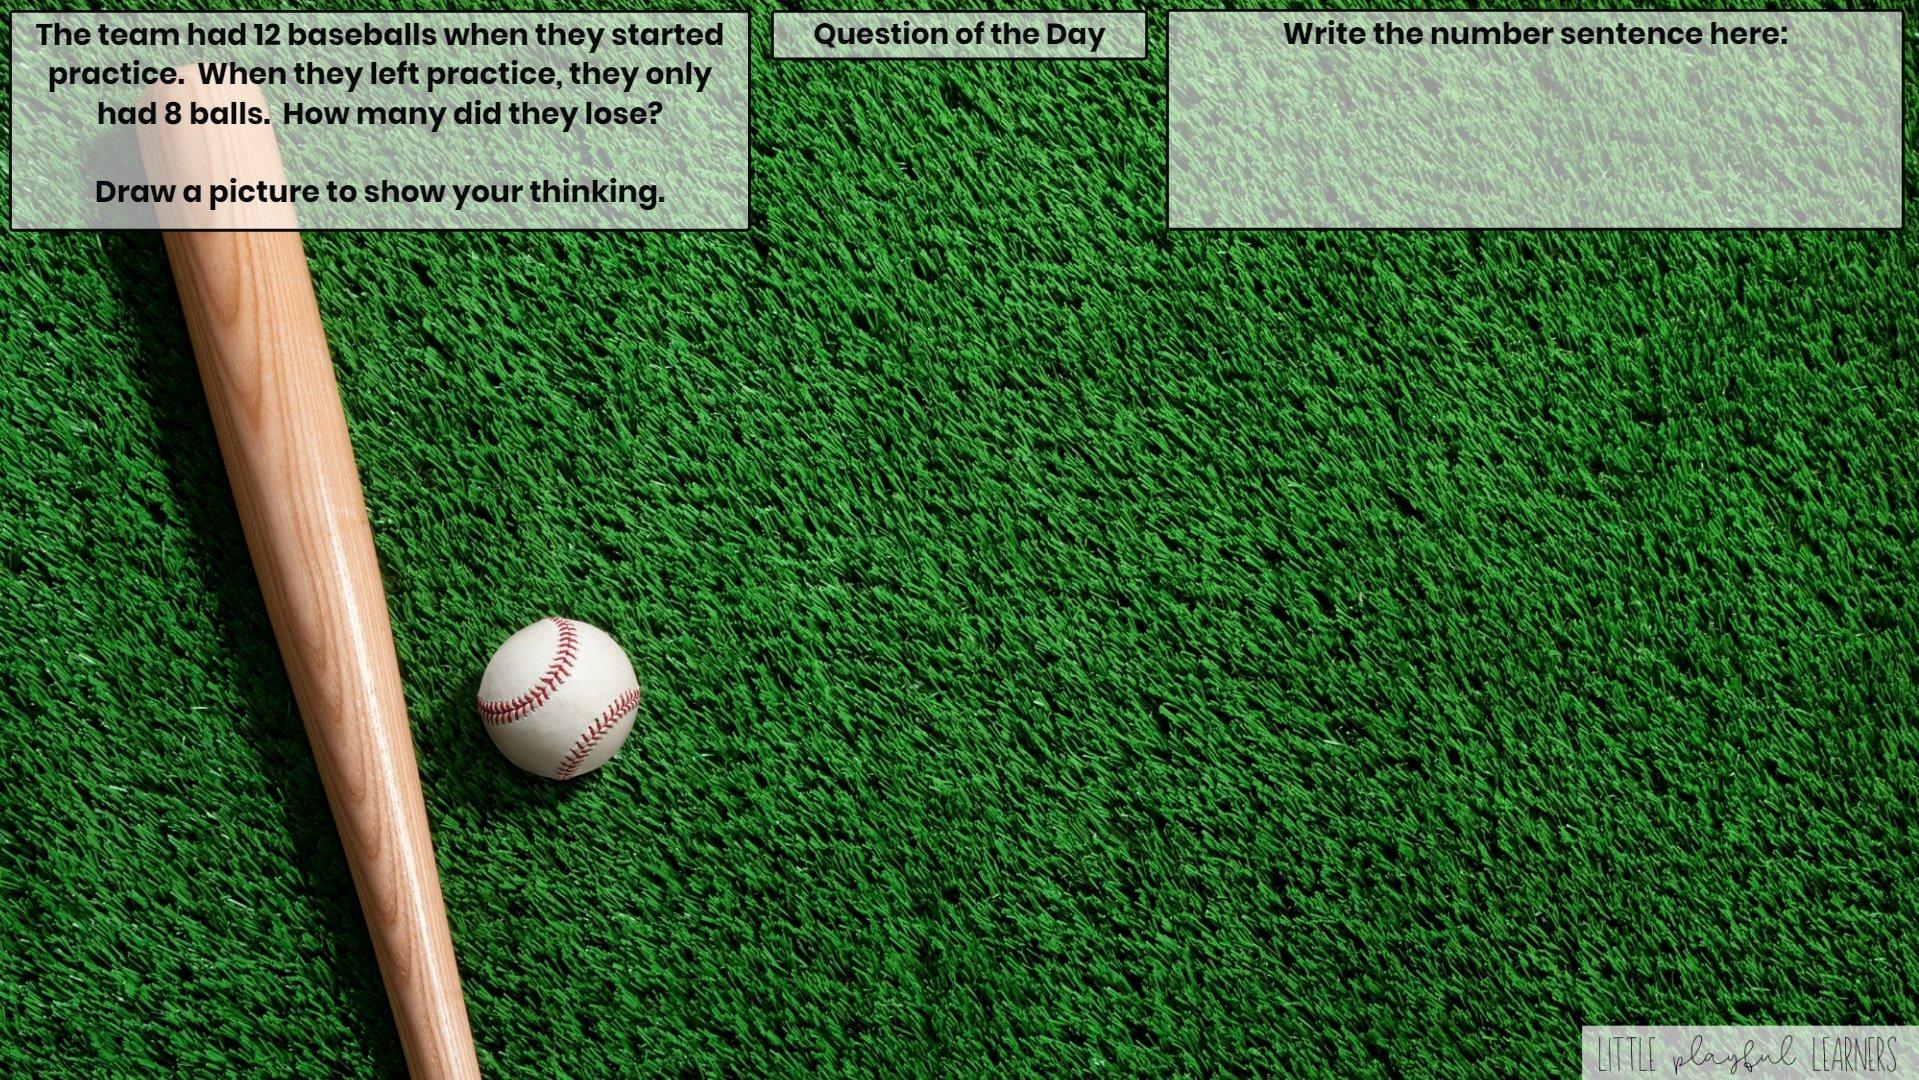 Seesaw: Story problem - baseball theme